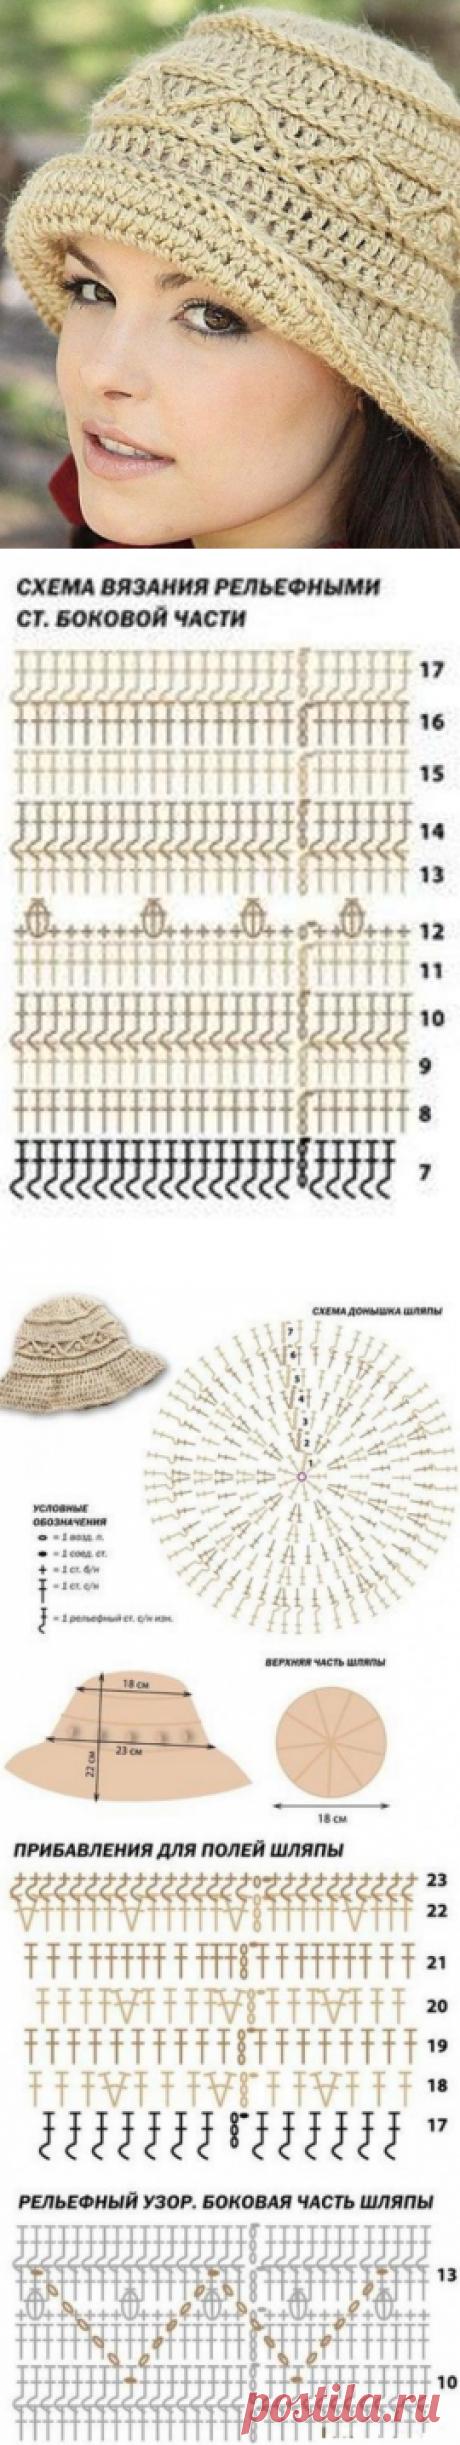 Шляпа - крючком